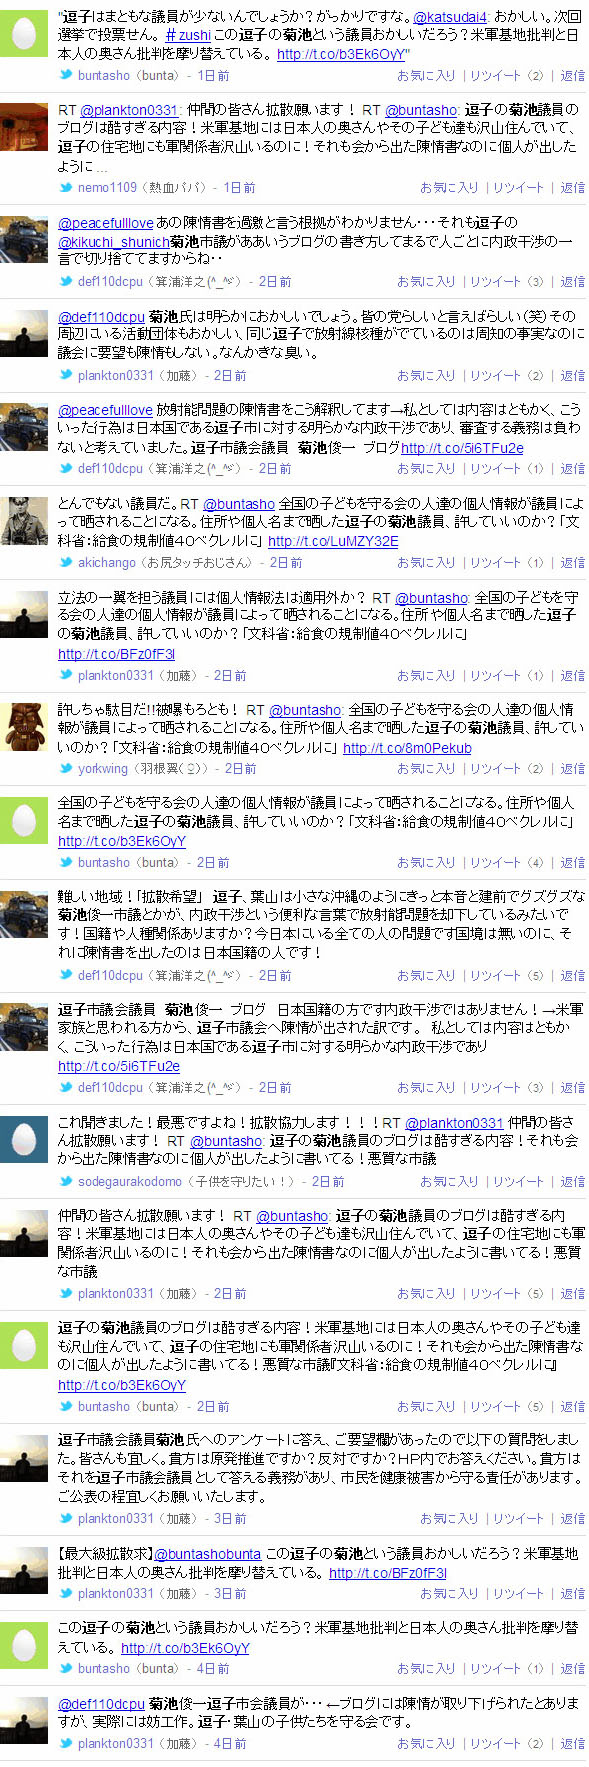 kikuchi_twitter2.jpg